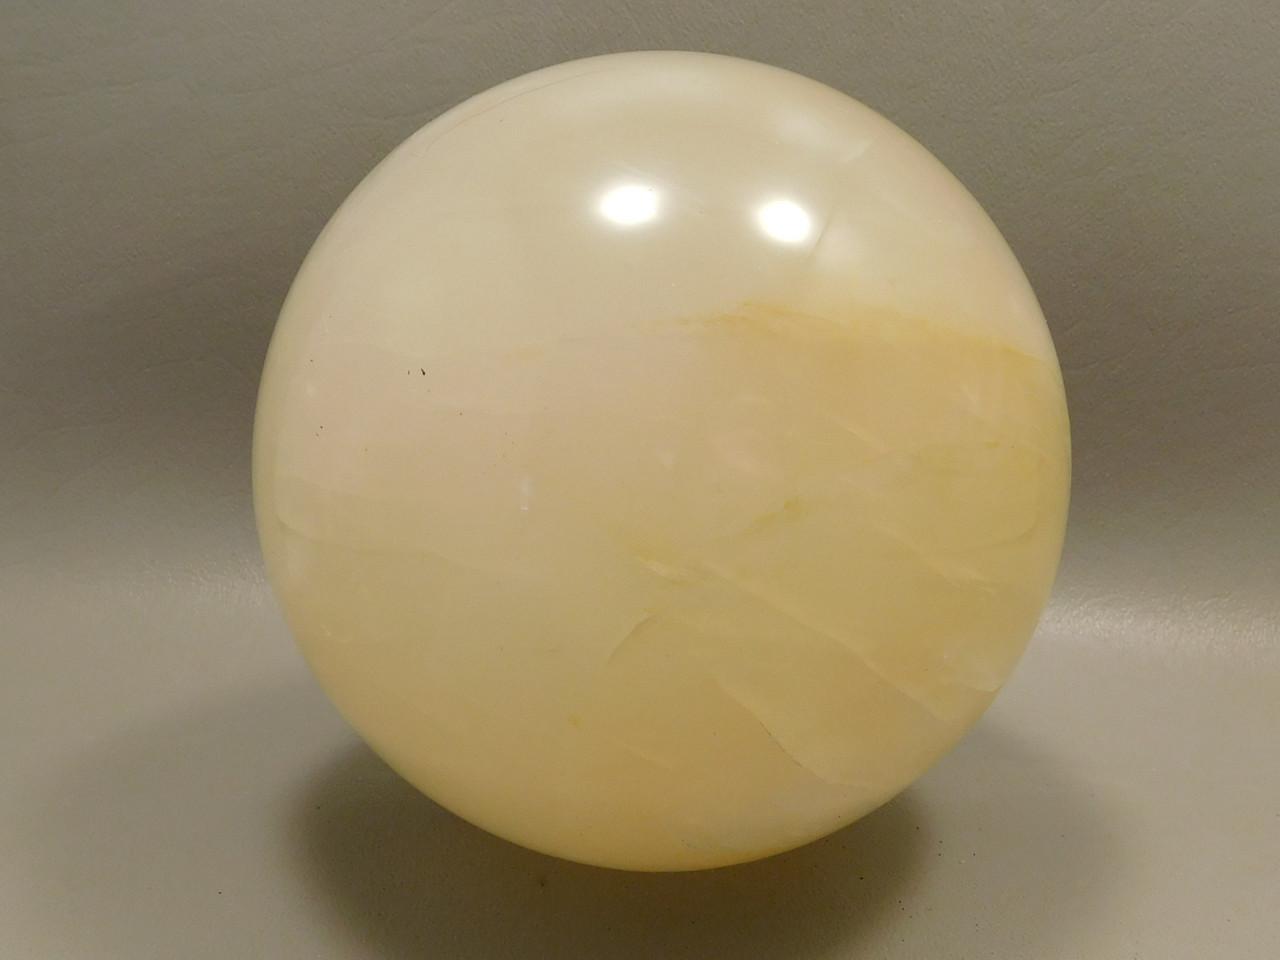 Golden Quartz Crystal Ball Large 4 inch Polished Stone Sphere #O10